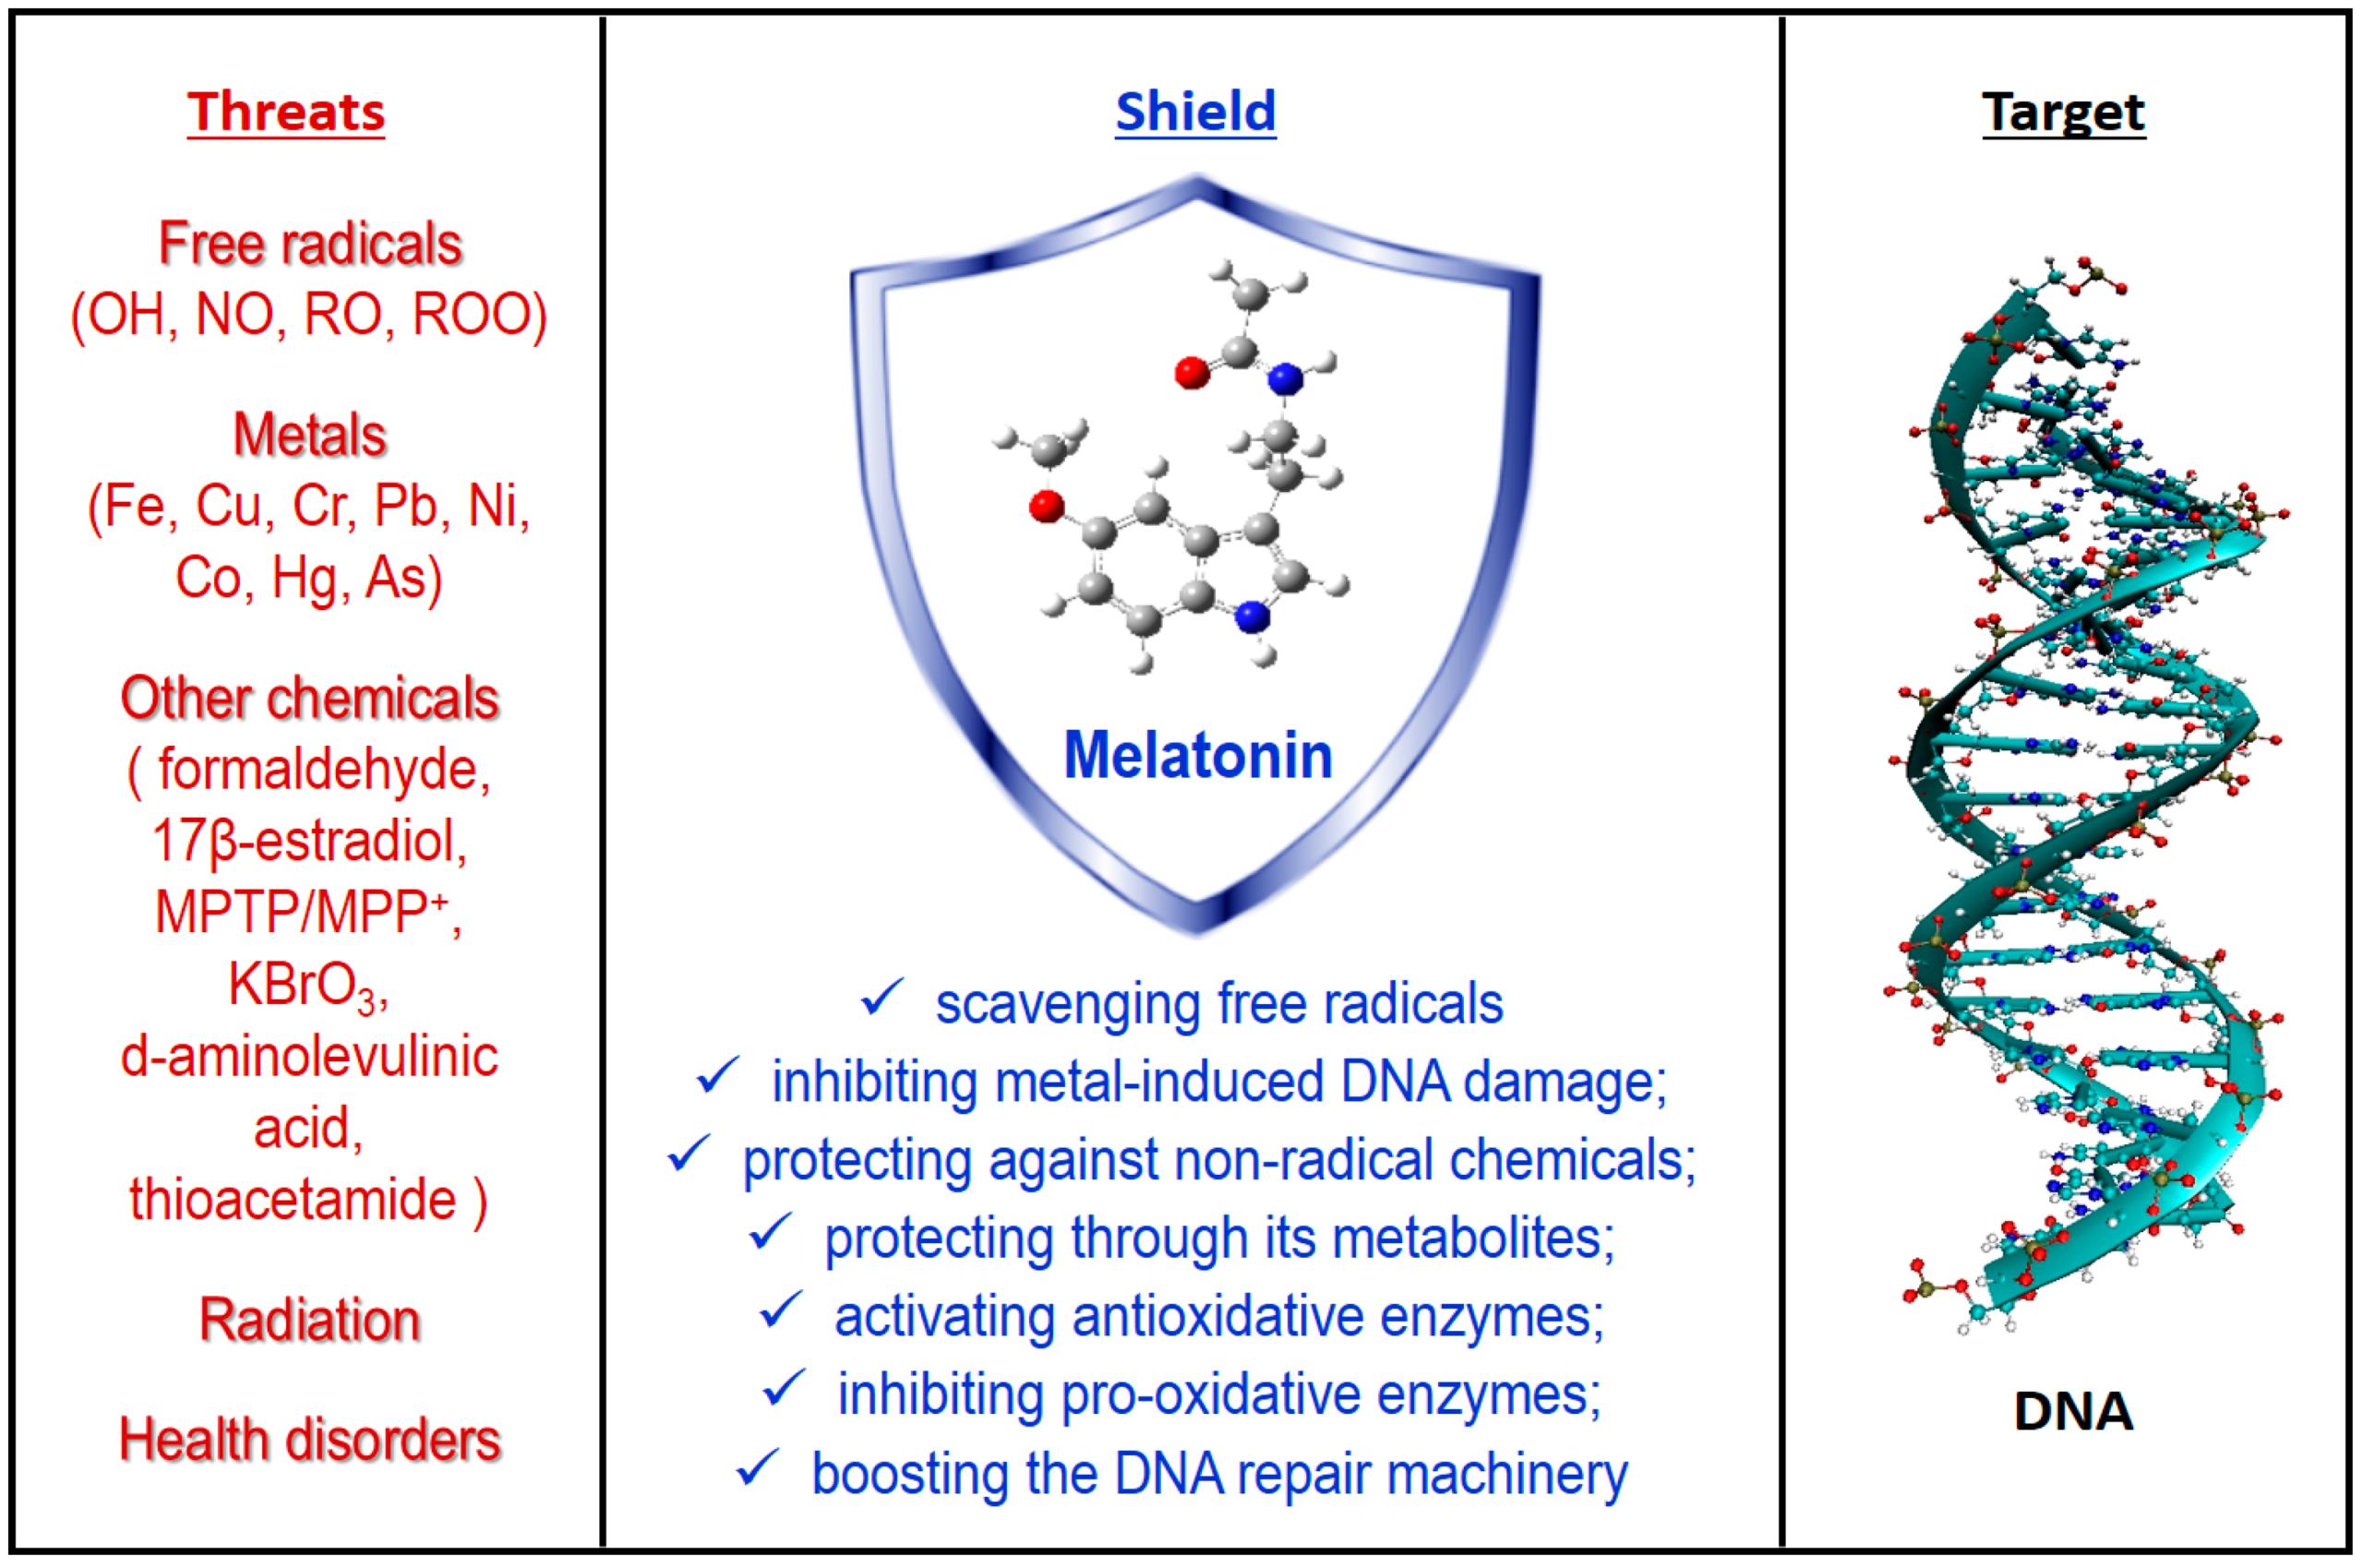 Мелатонин защищает ДНК клеток